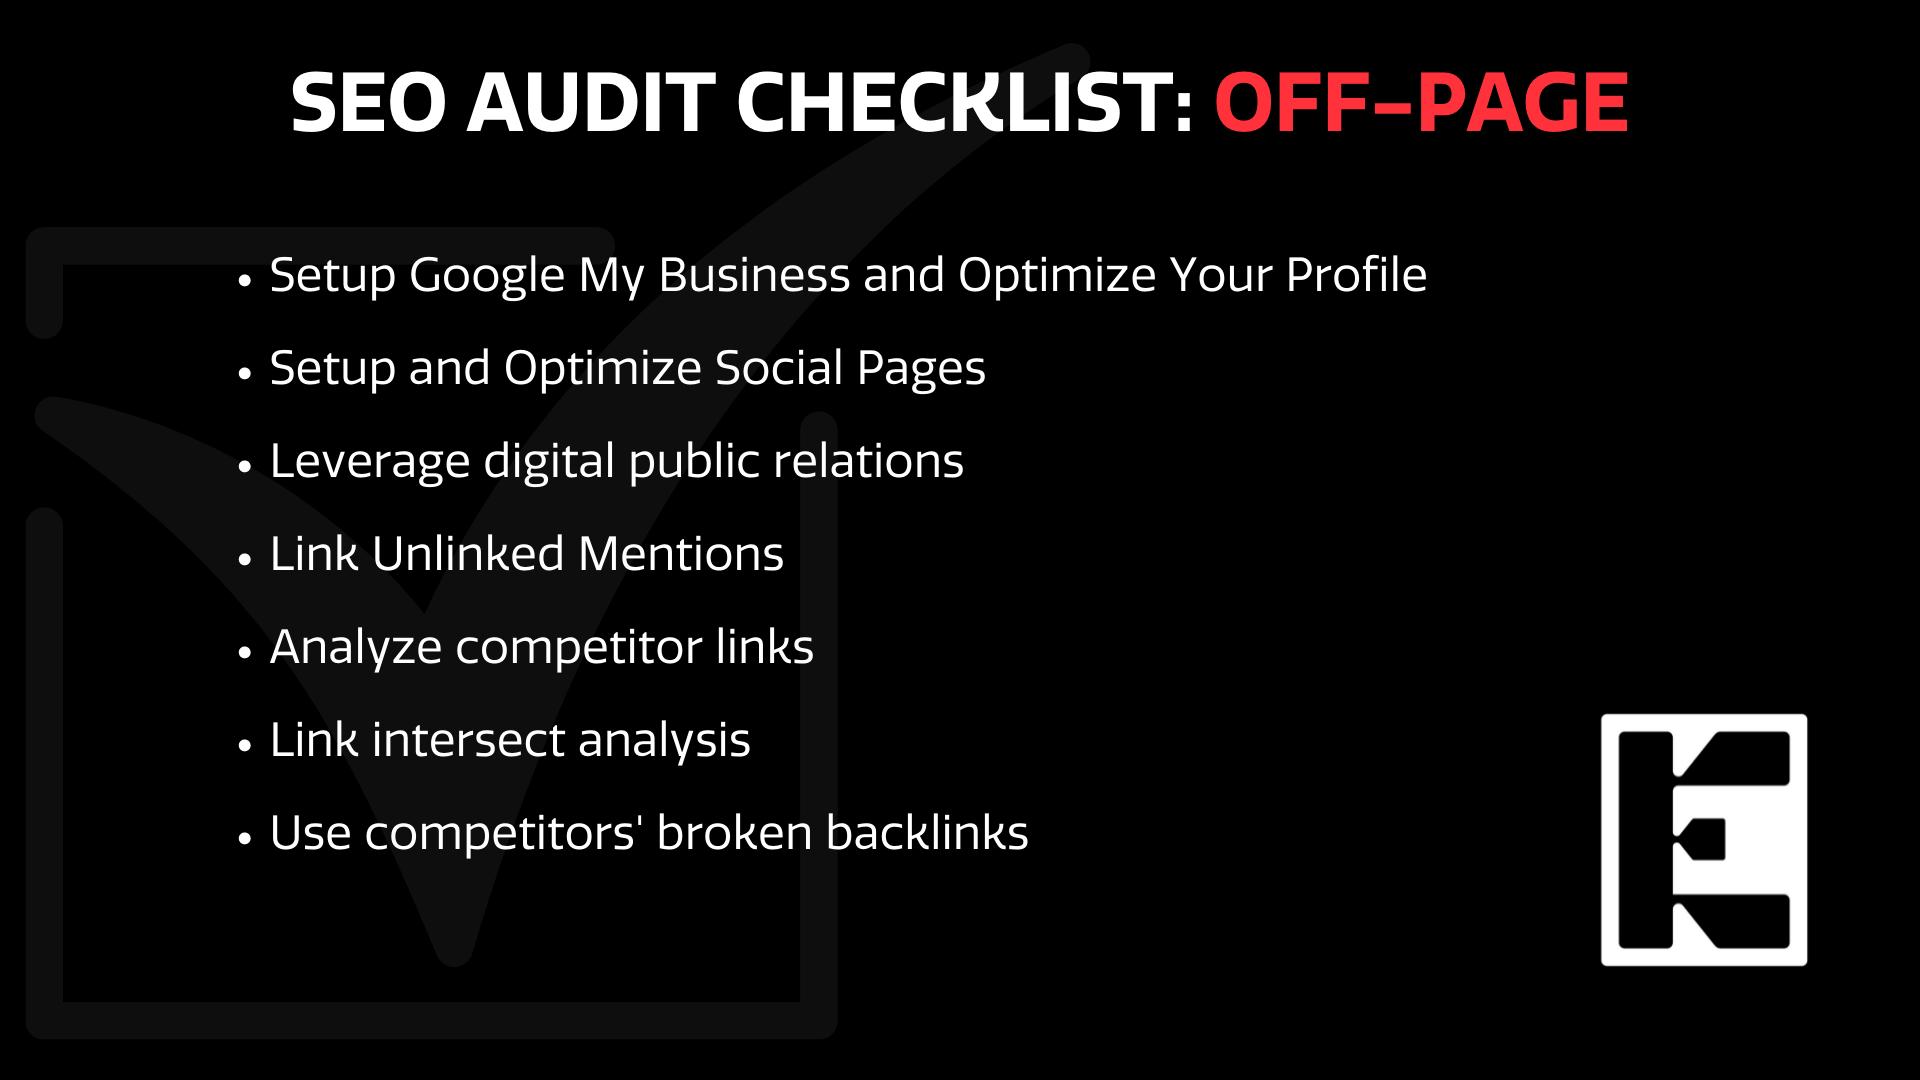 SEO off page checklist